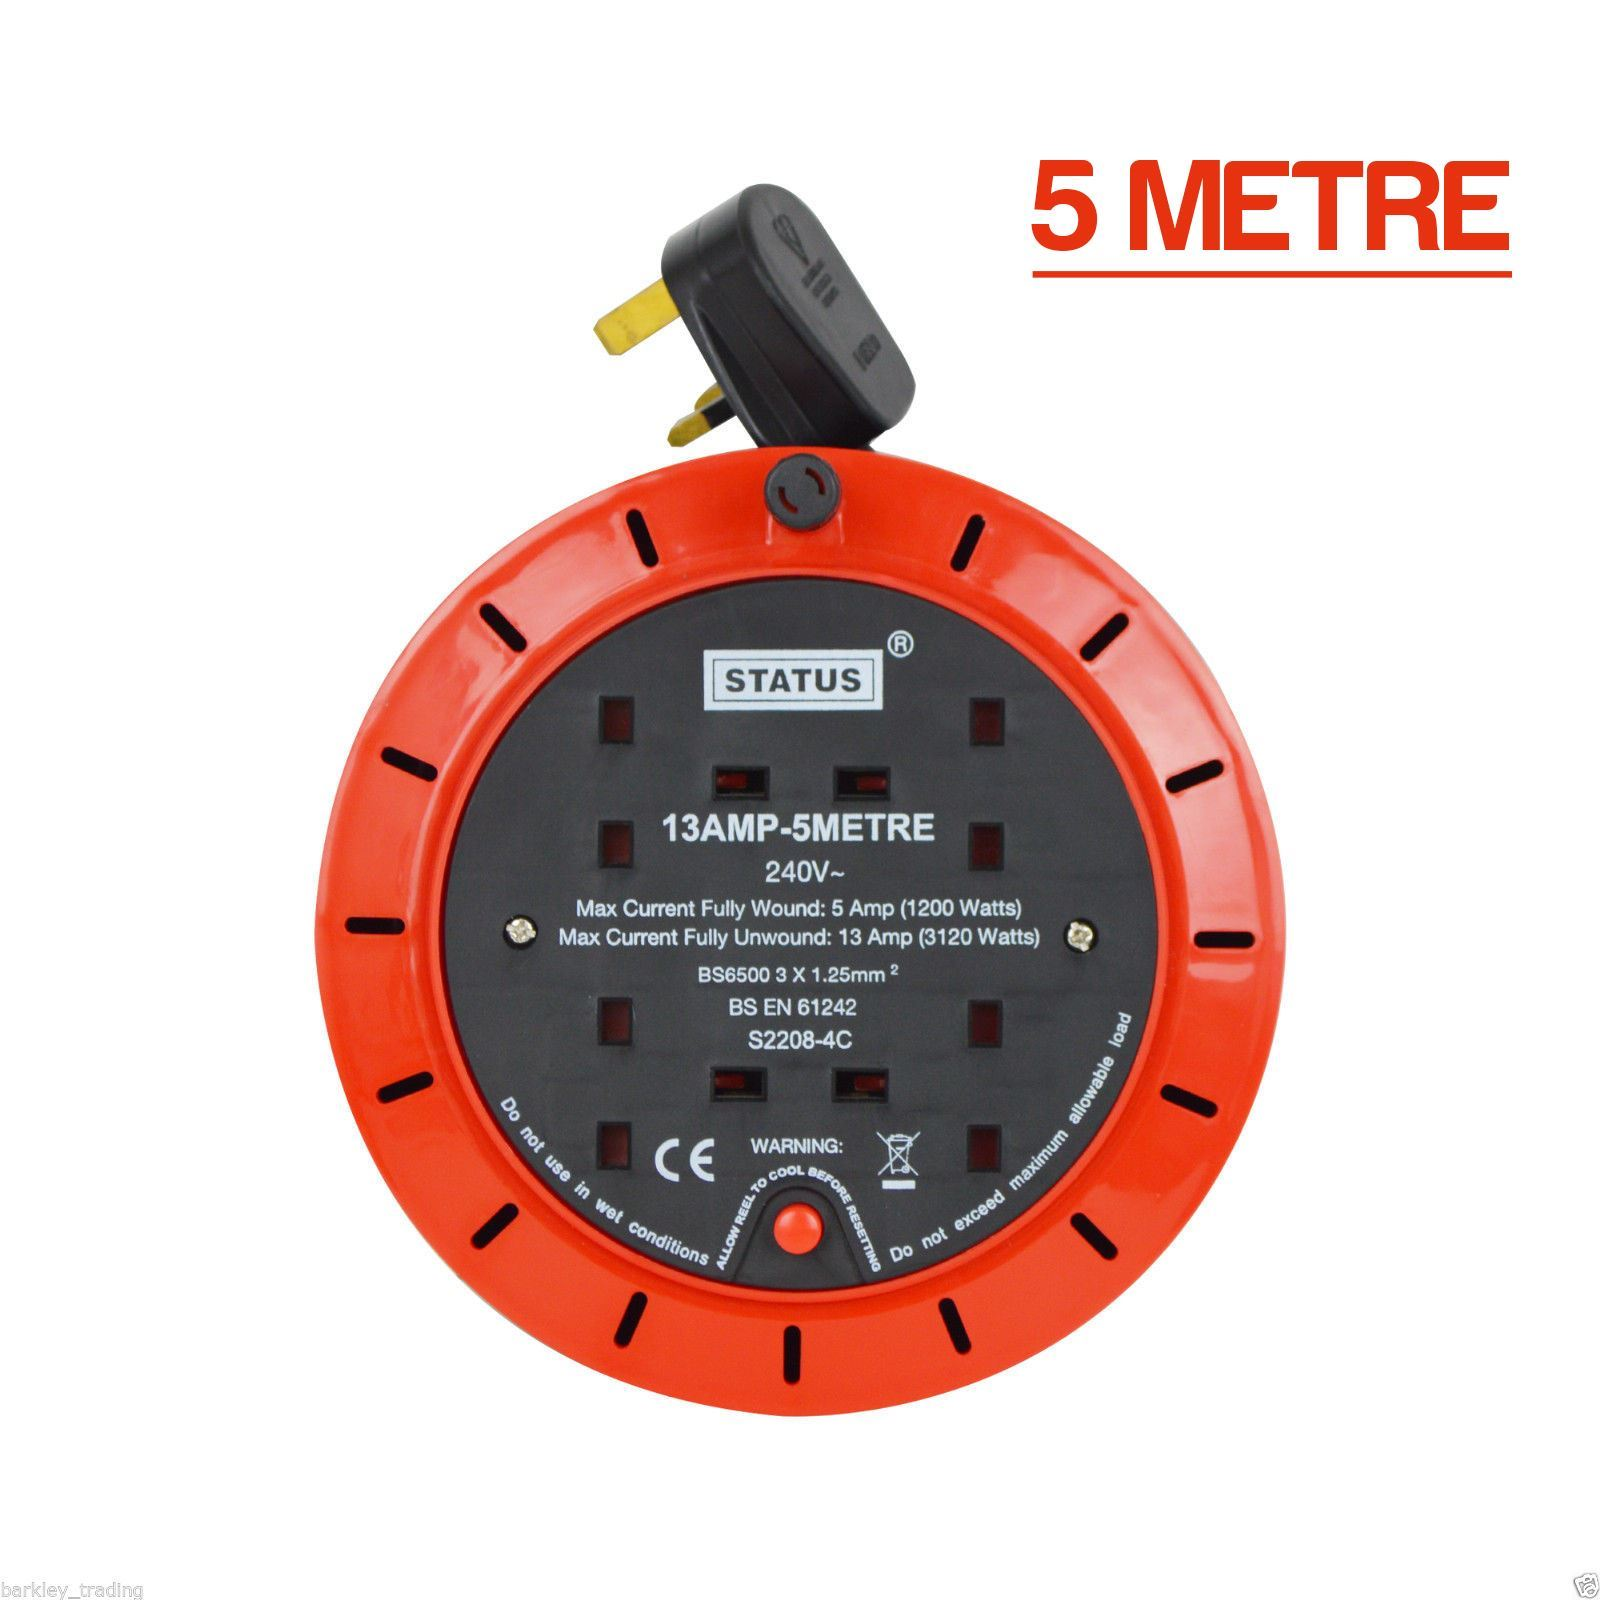 6 way extension lead 3m viper 5704 wiring diagram power mains leads 2m 5m 10m 15m 20m 25m 2 4 8 gang